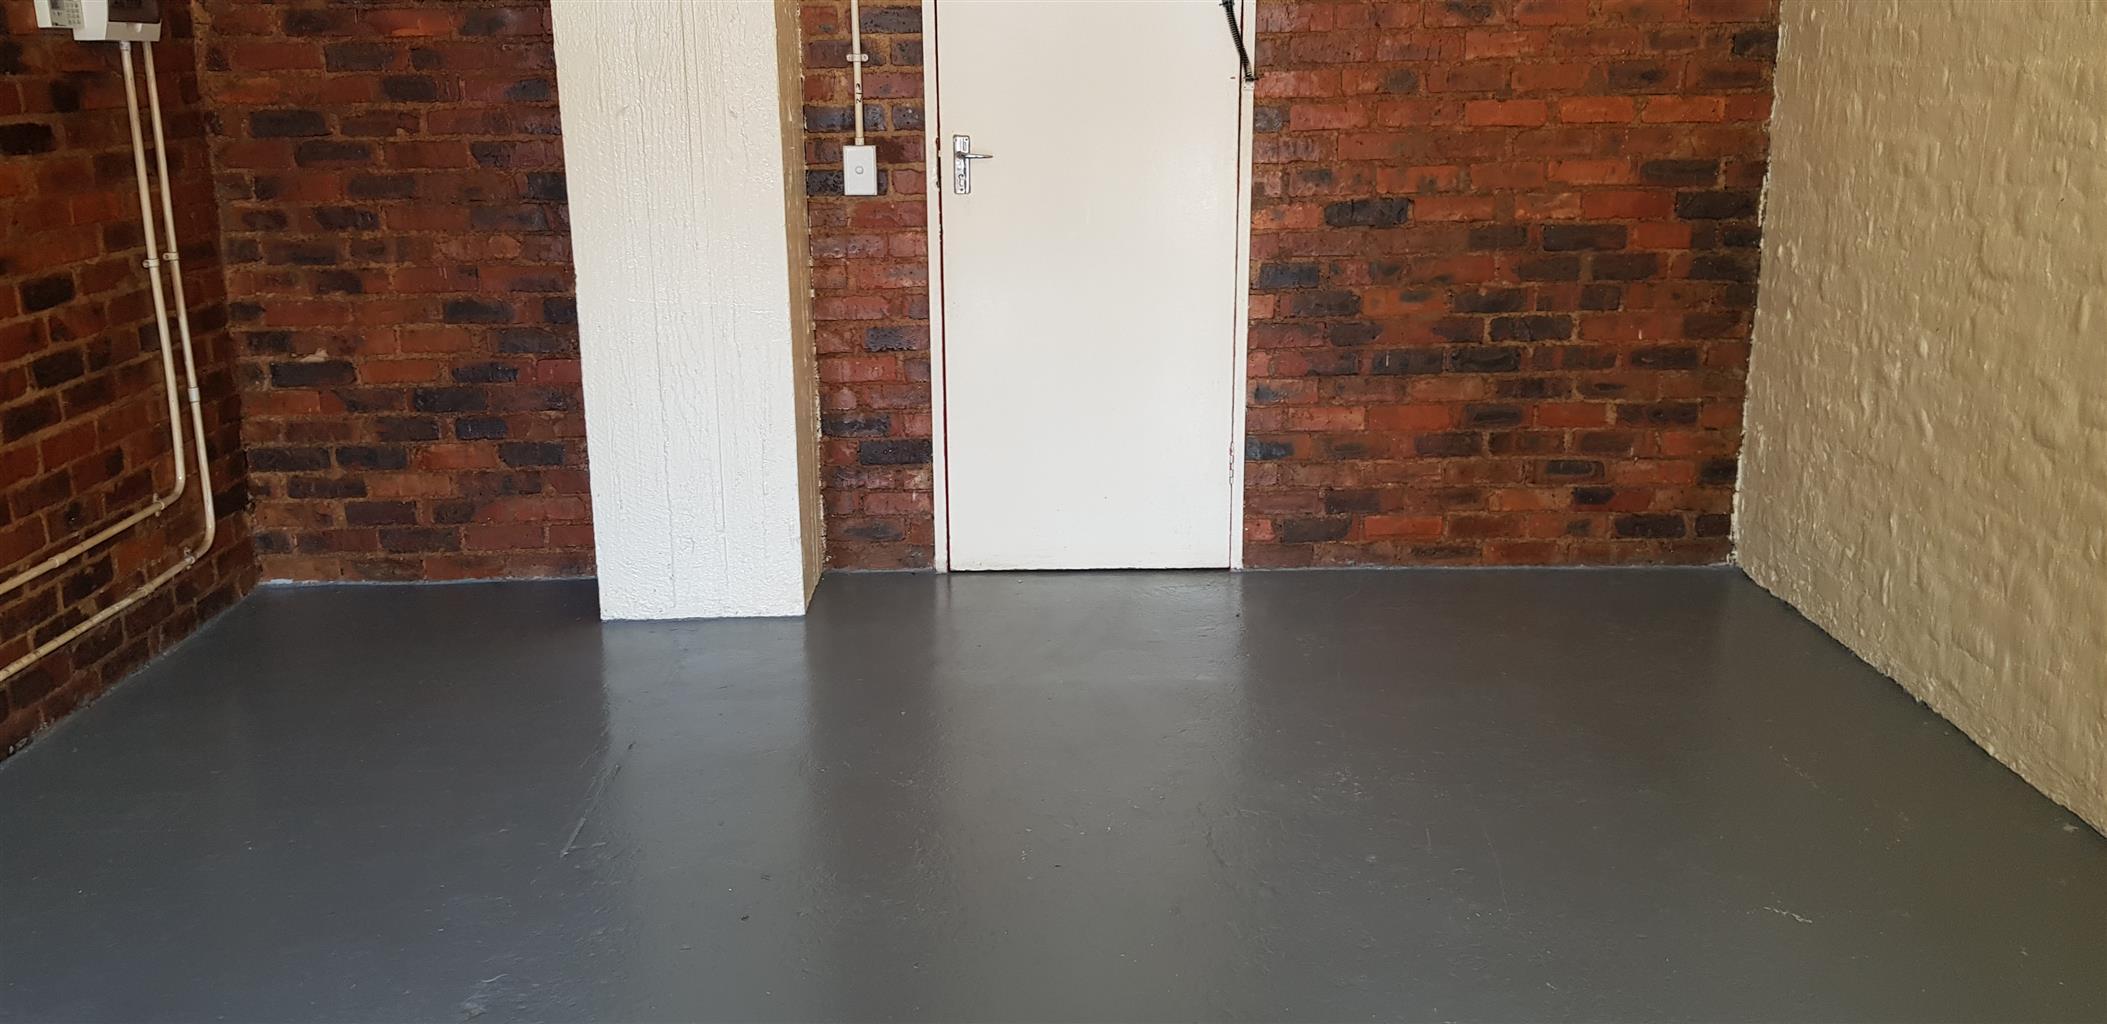 Bachelor Loft Apartments Available Johannesburg Cbd No Deposit